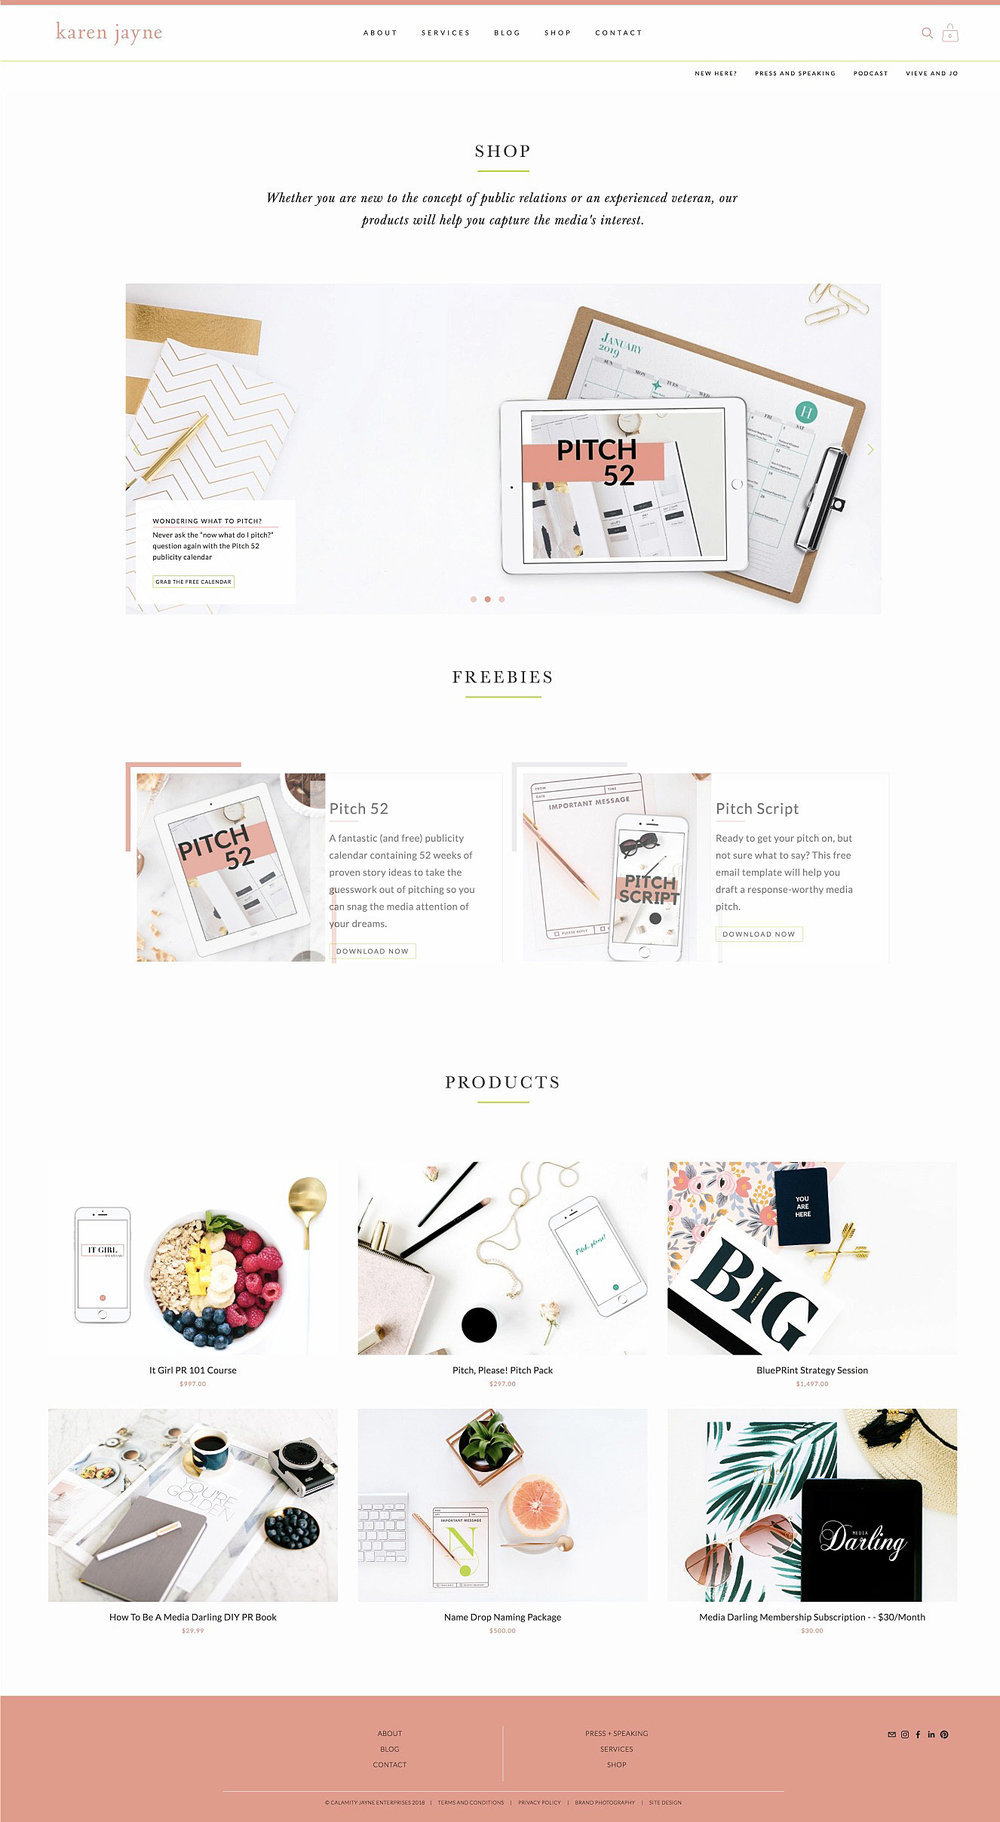 KJ Blattenbauer Shop page   Clean and minimal Squarespace web design by Jodi Neufeld Design #squarespace #webdesign